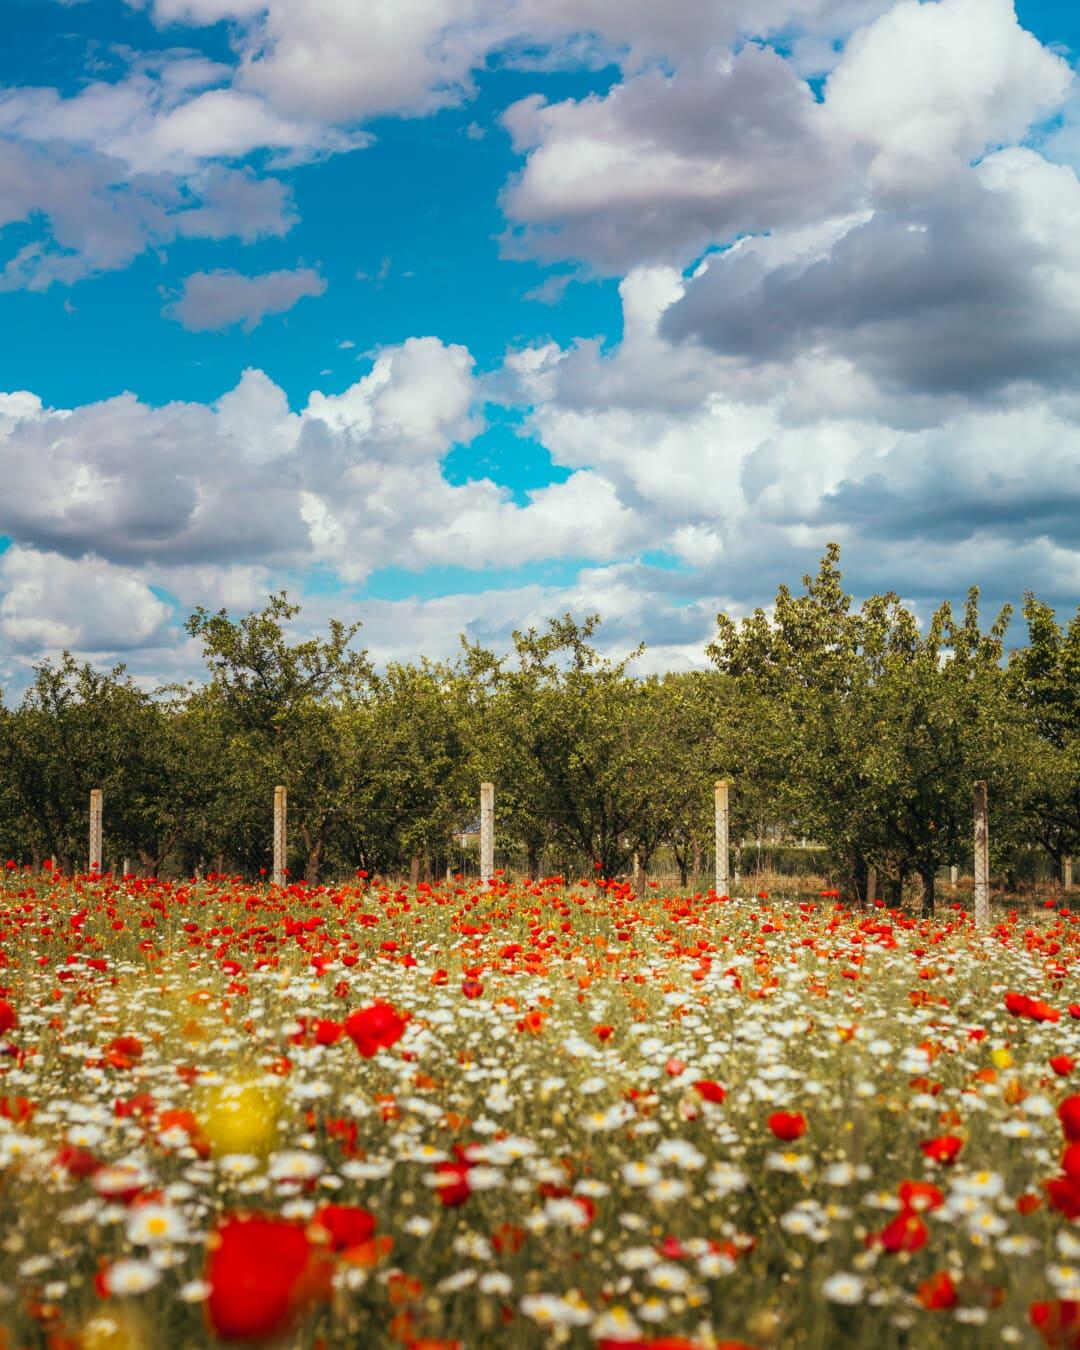 Agriculture, verger, arbres, domaine, coquelicot, fleurs sauvages, camomille, paysage, rural, fleur